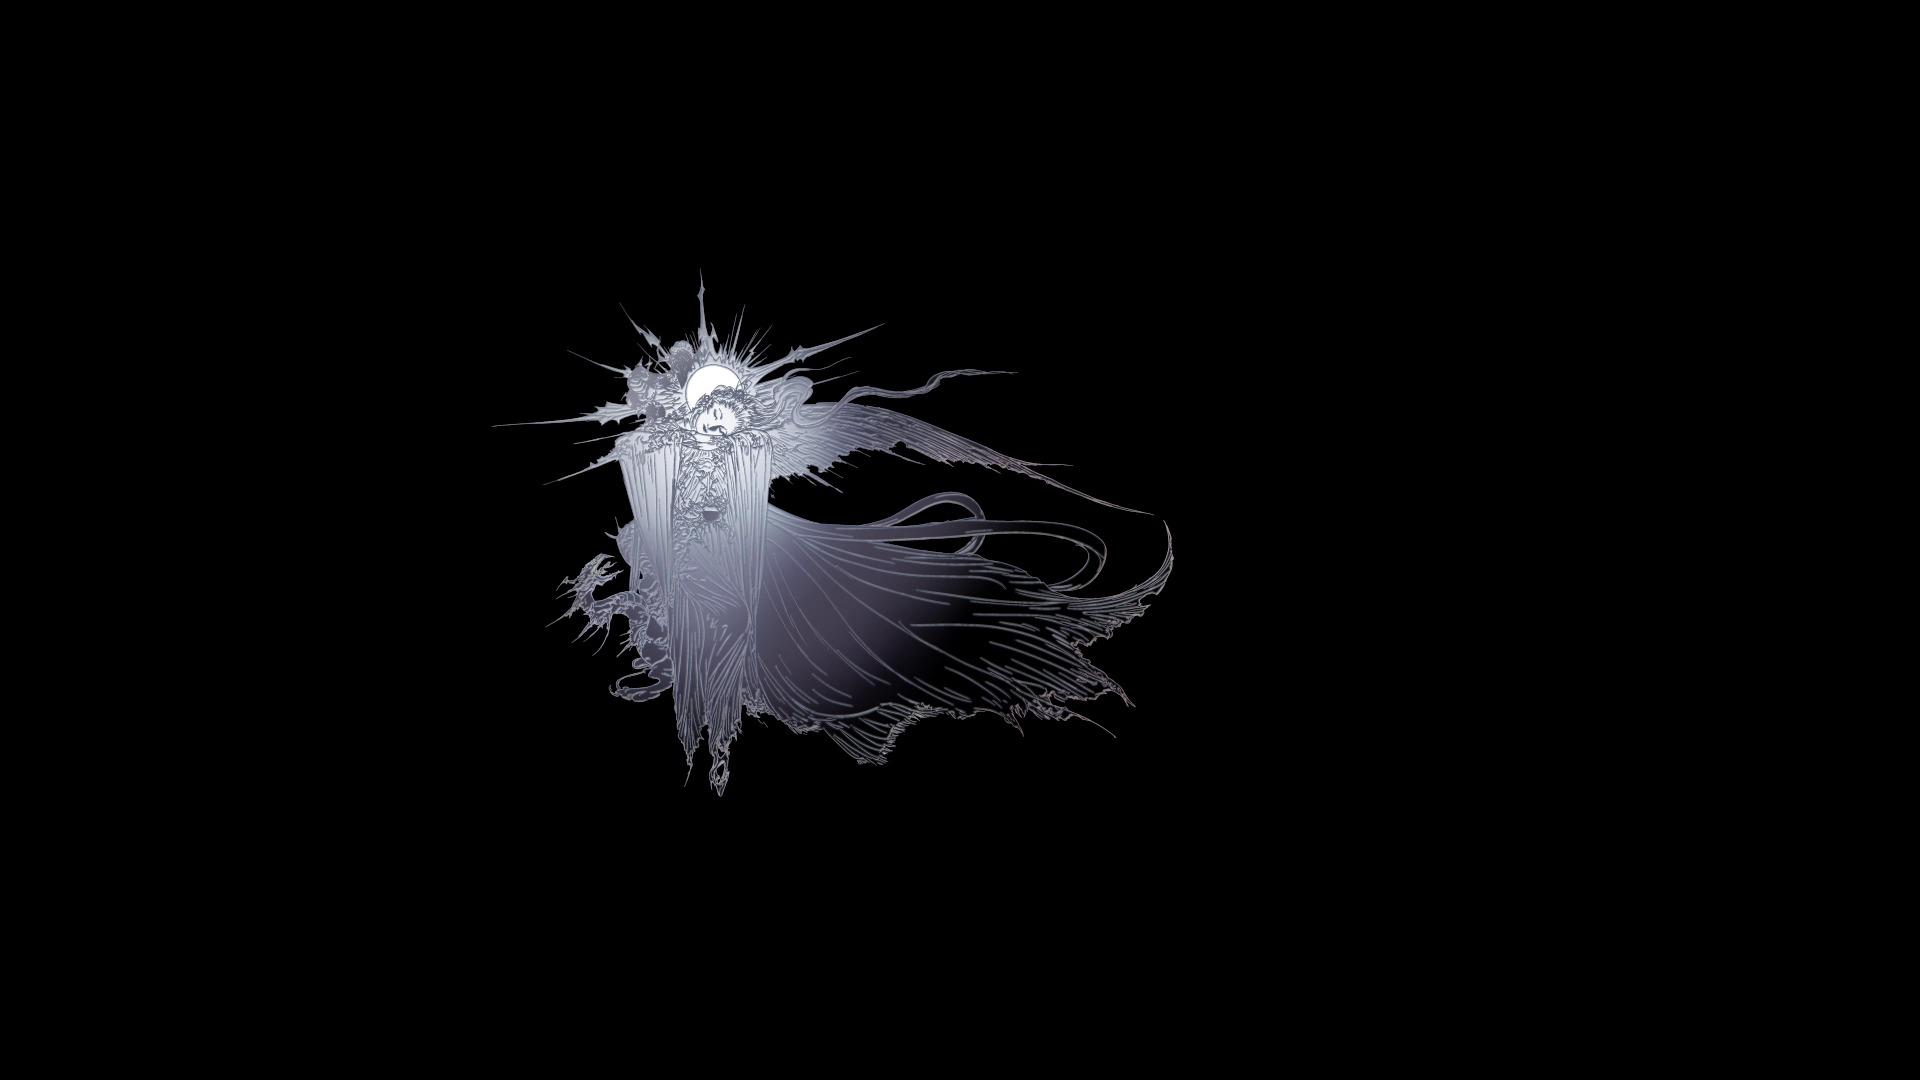 Final Fantasy Xv Ps3 wallpaper   1459126 1920x1080